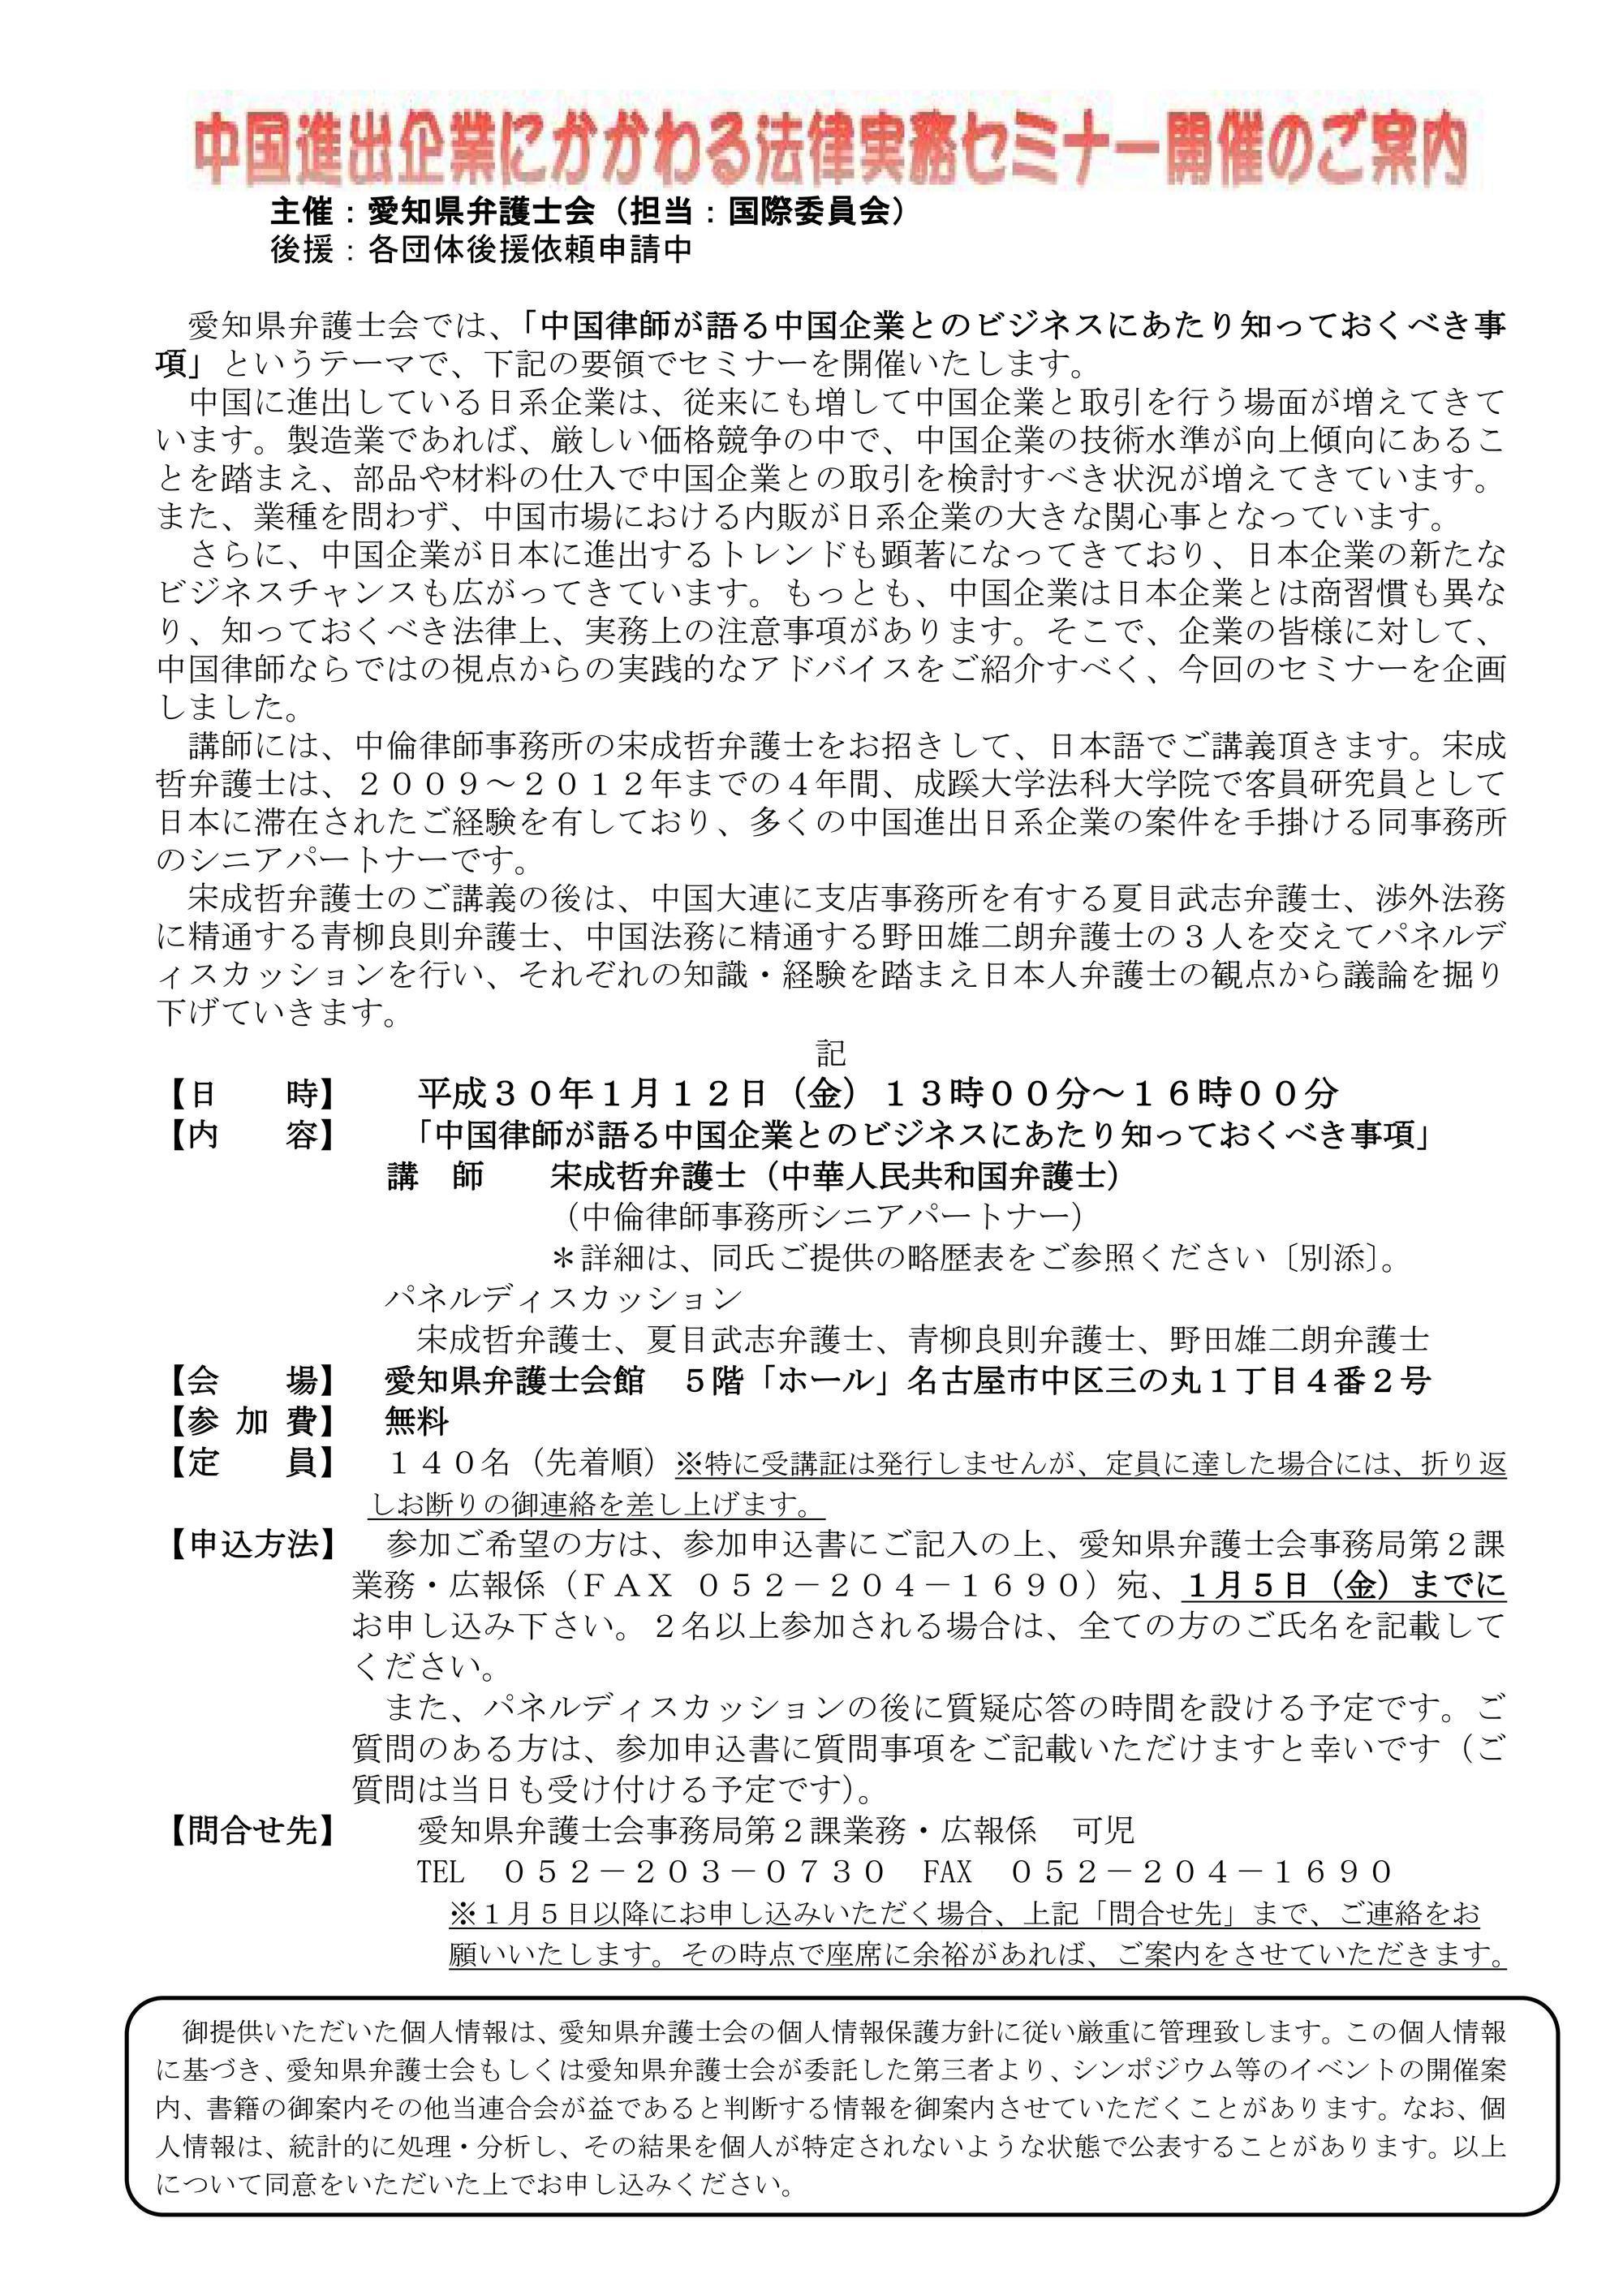 中国法セミナー案 (企業宛)20171208.jpg